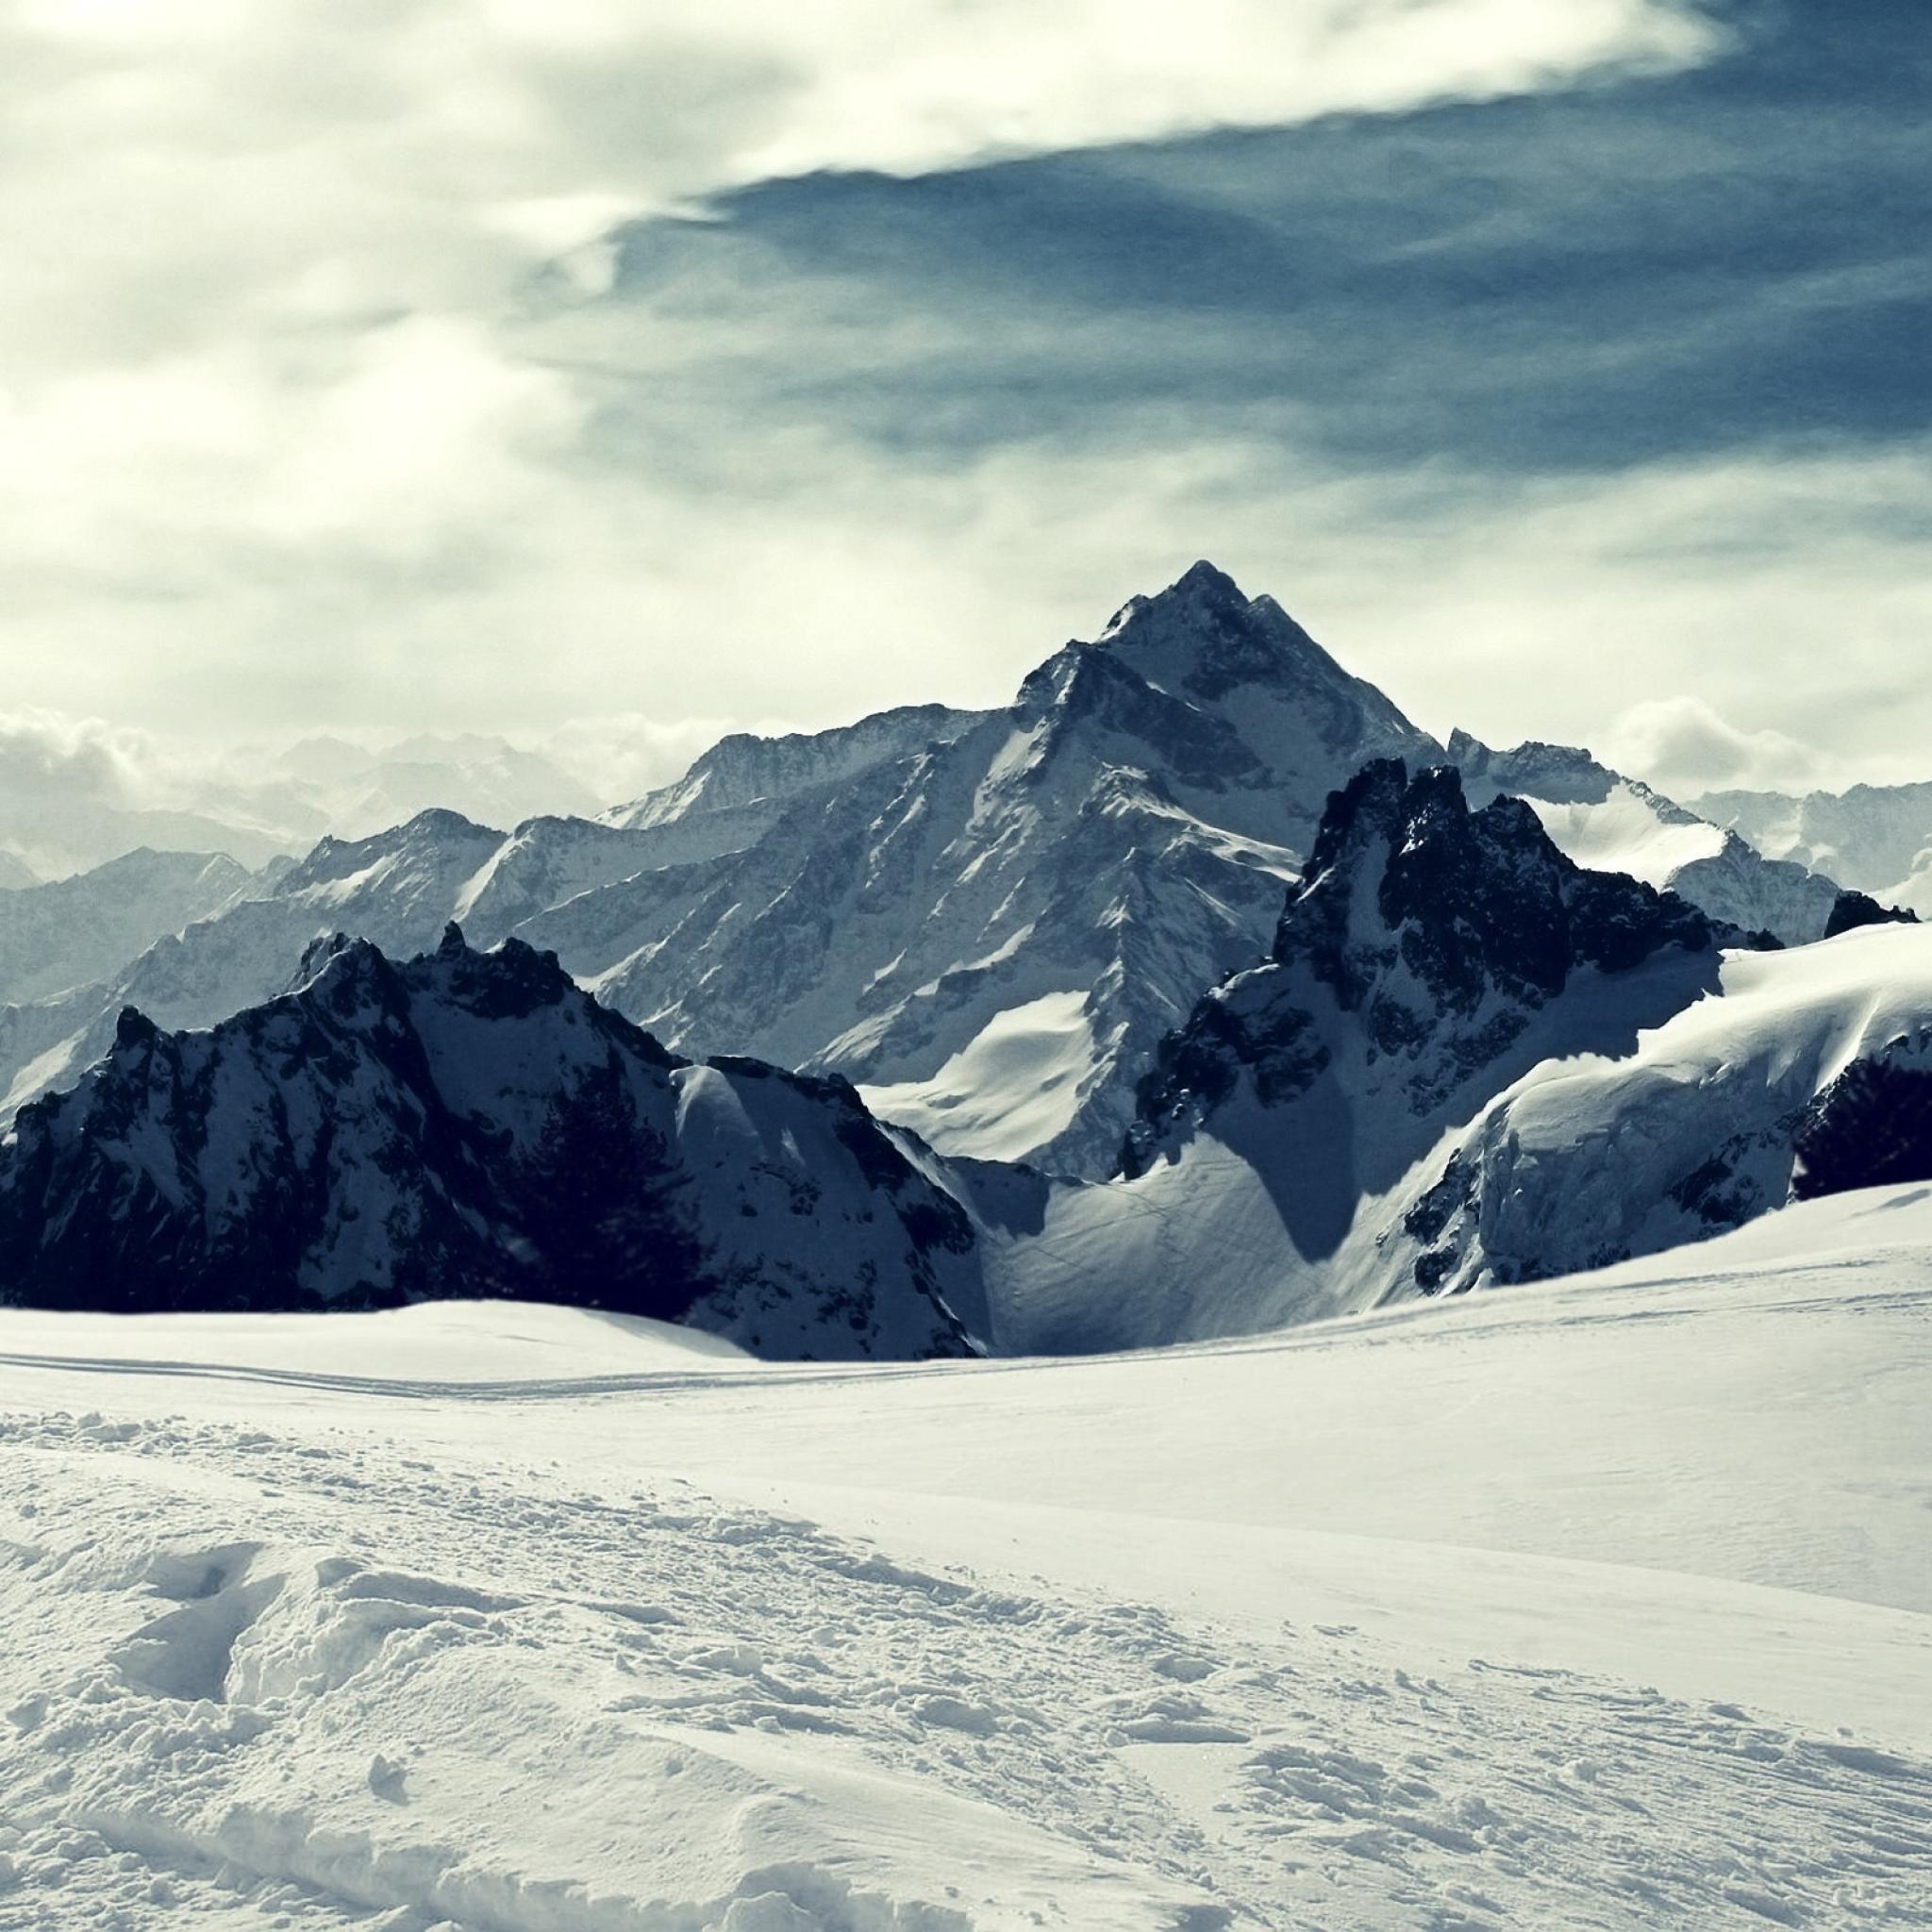 Mount Everest, Snow, Landscape, Nature wallpaper thumb